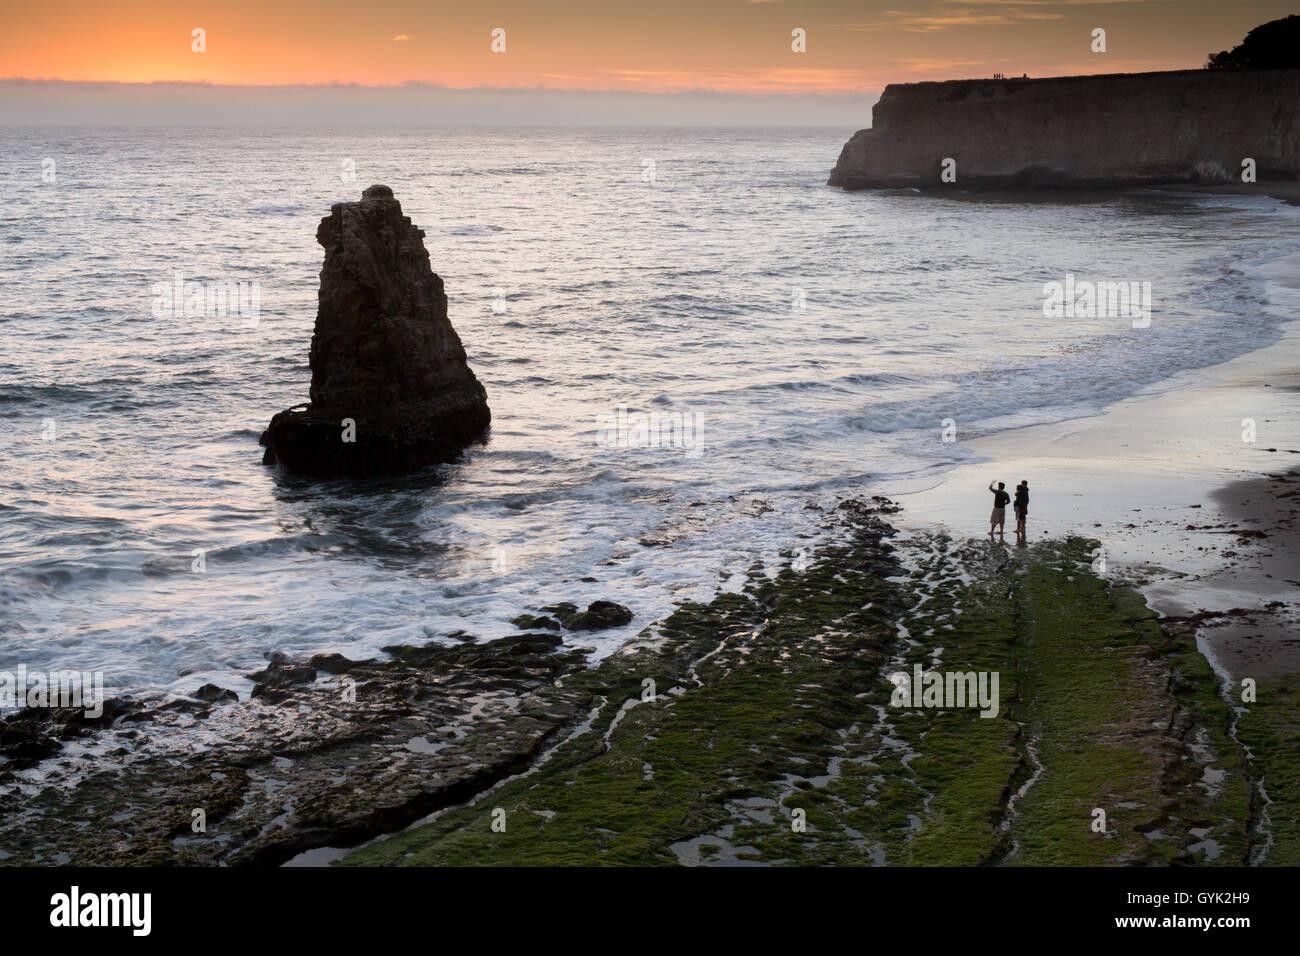 Pacific Ocean sunset from San Vicente Creek, Davenport, California, USA Stock Photo